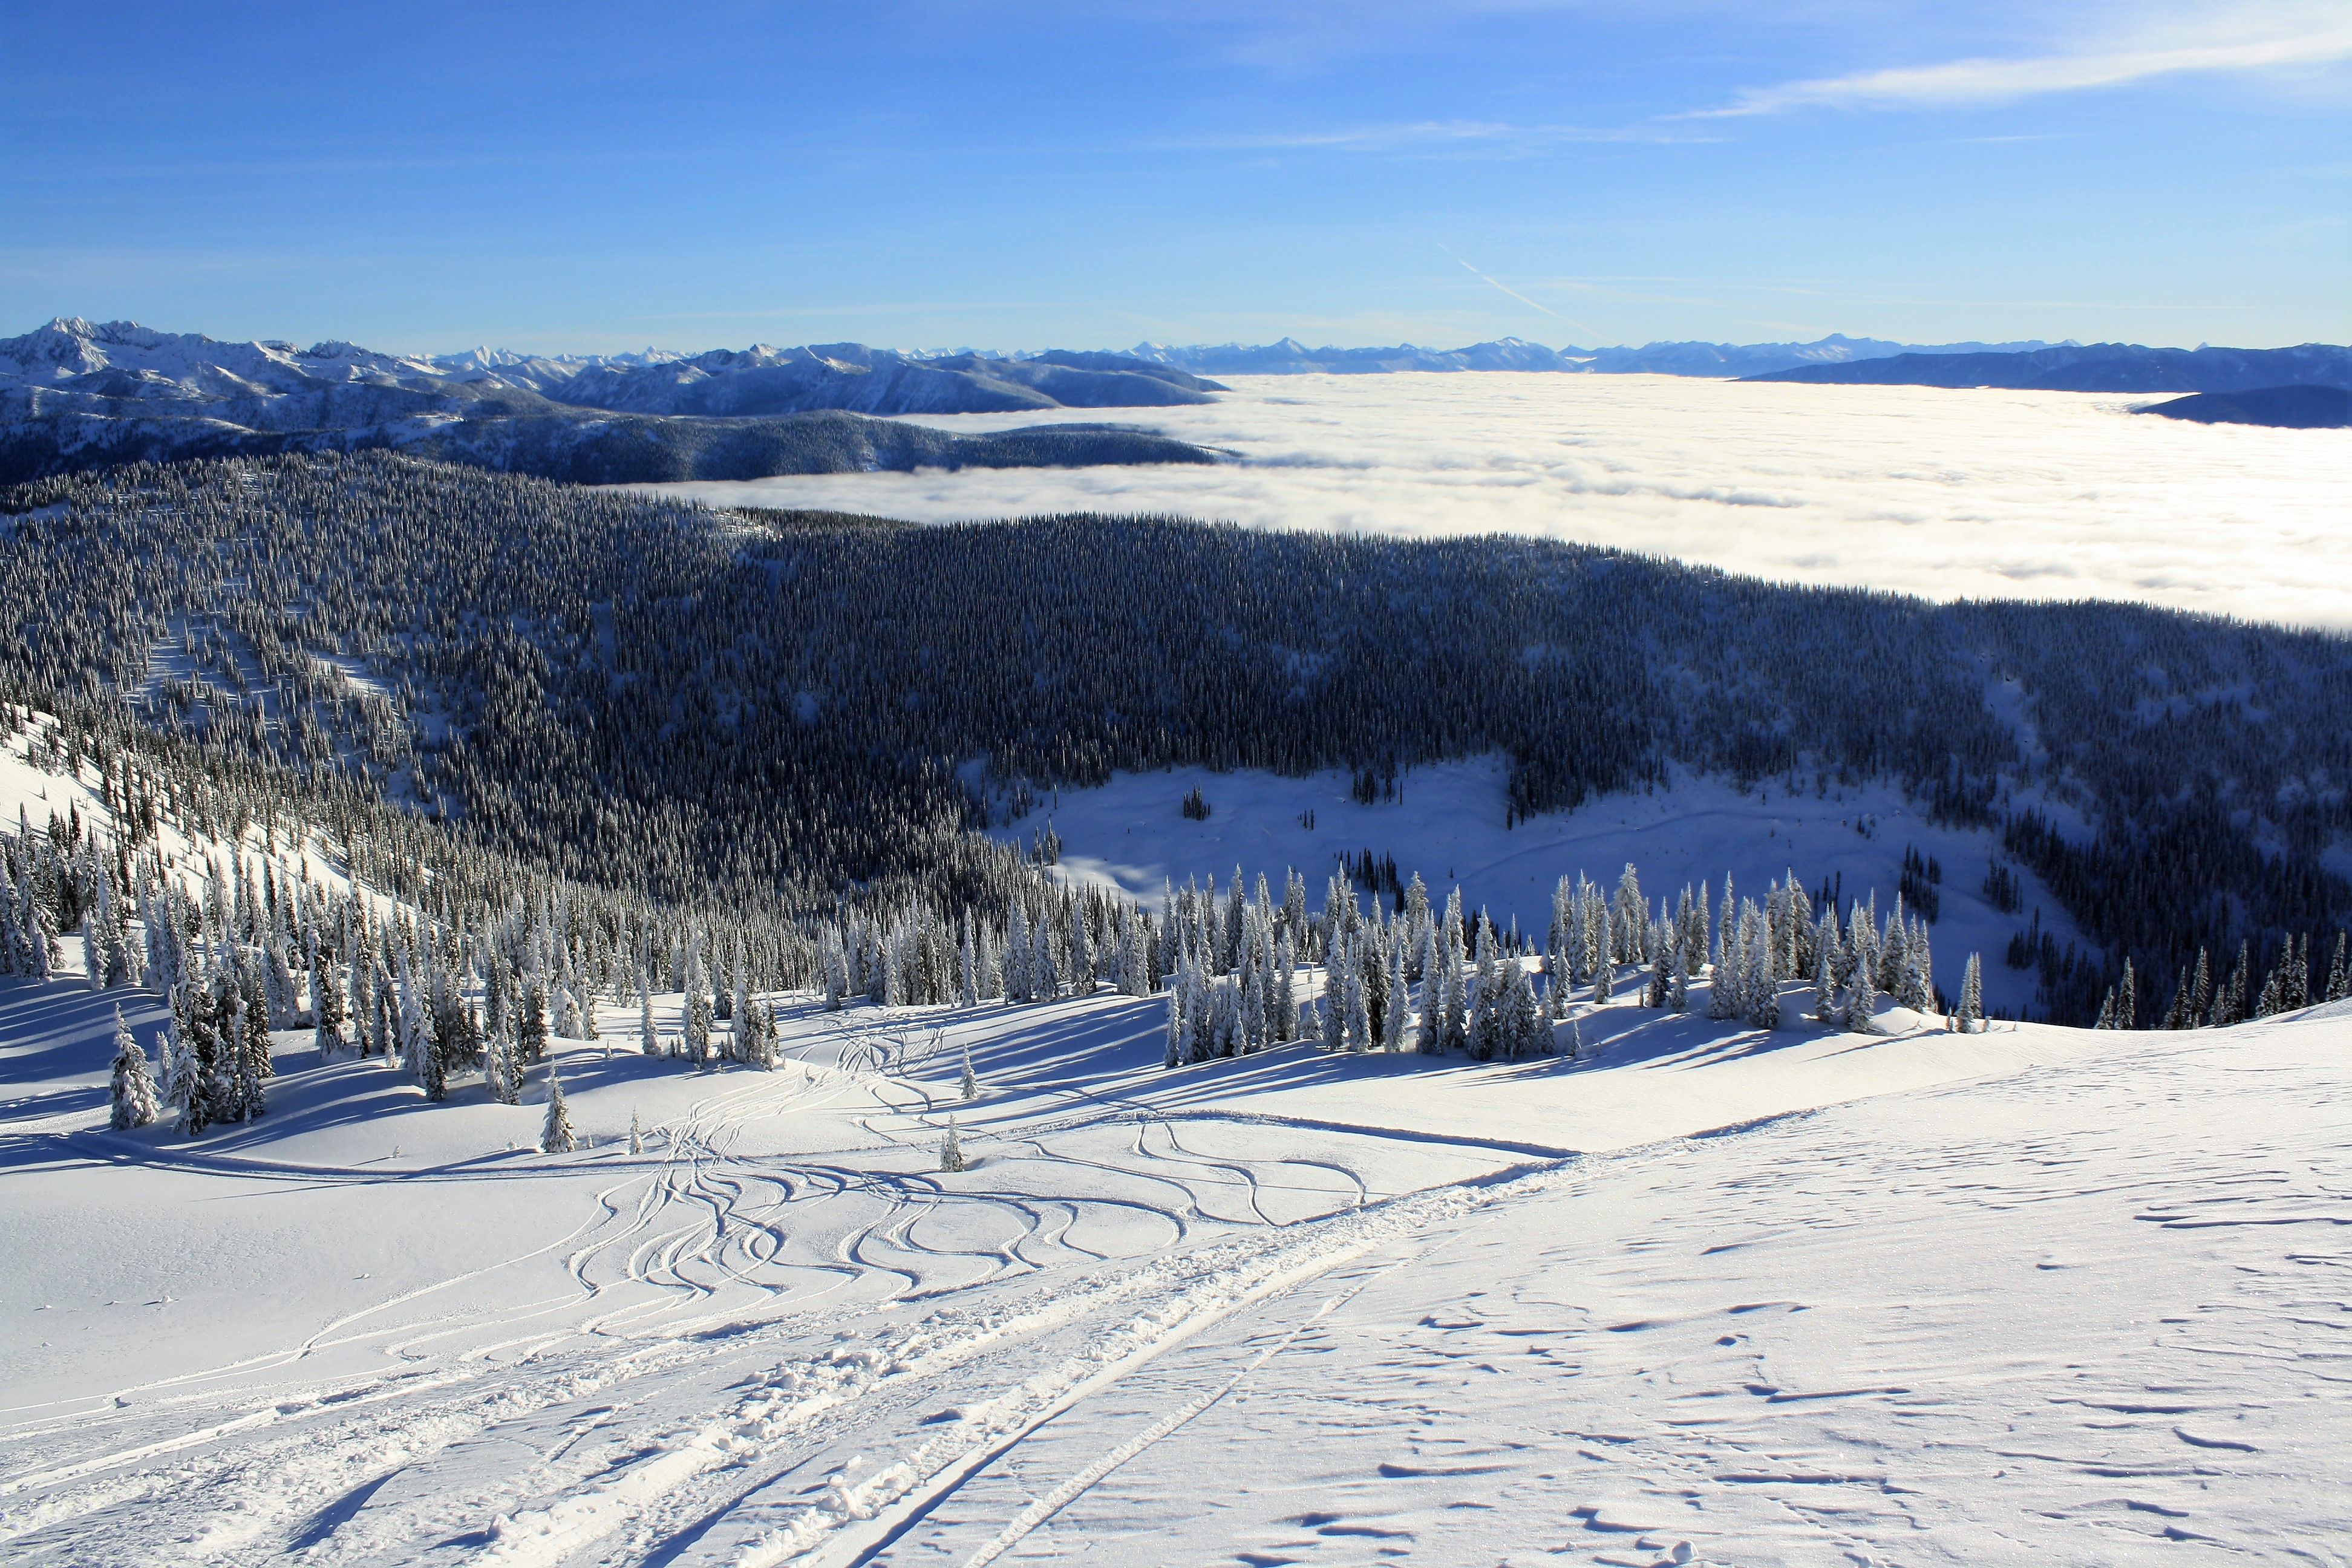 DM_nature_winter_kootenays_1829